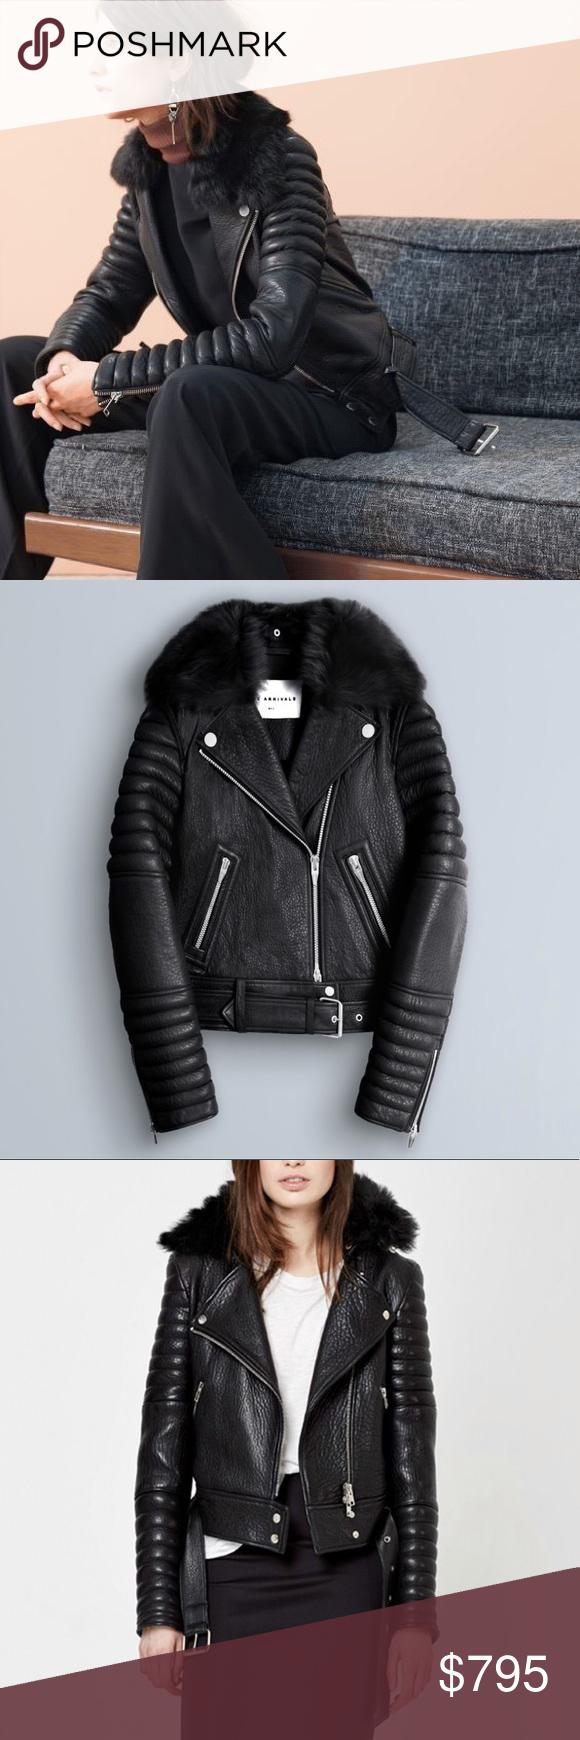 The Arrivals Rainier Leather Moto Jacket Sz Medium Leather Moto Jacket Outfit Zara Moto Jacket Outfit [ 1740 x 580 Pixel ]